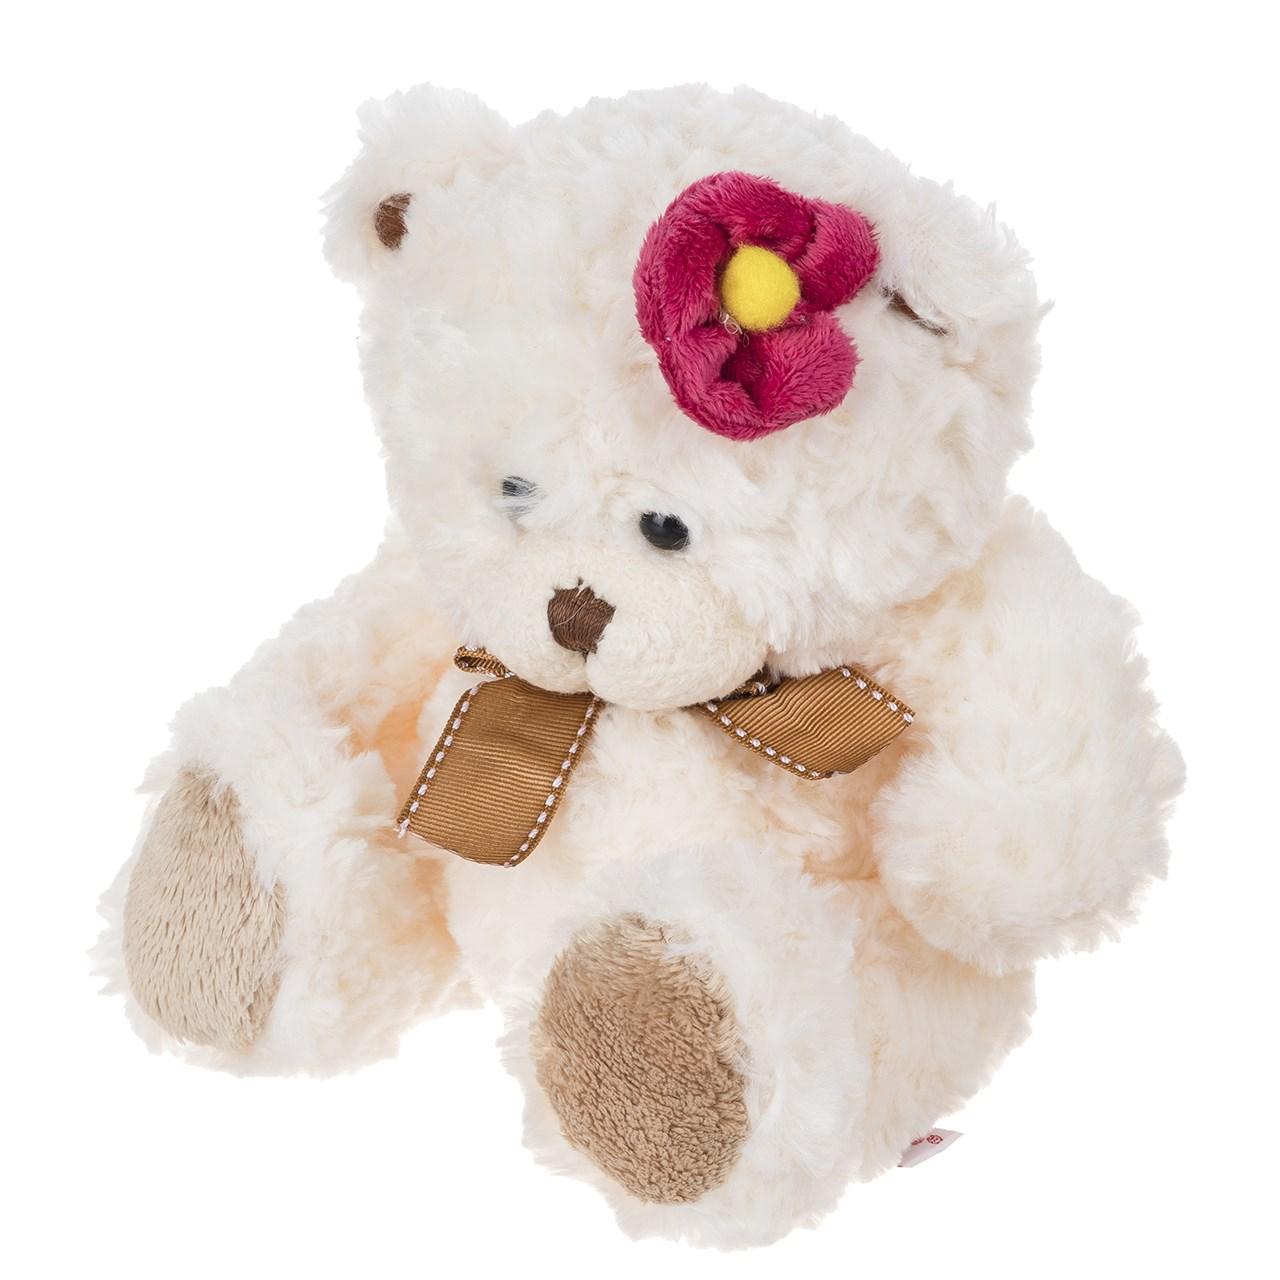 عروسک پاپی لاو مدل Bear With Flower ارتفاع 16.5 سانتی متر